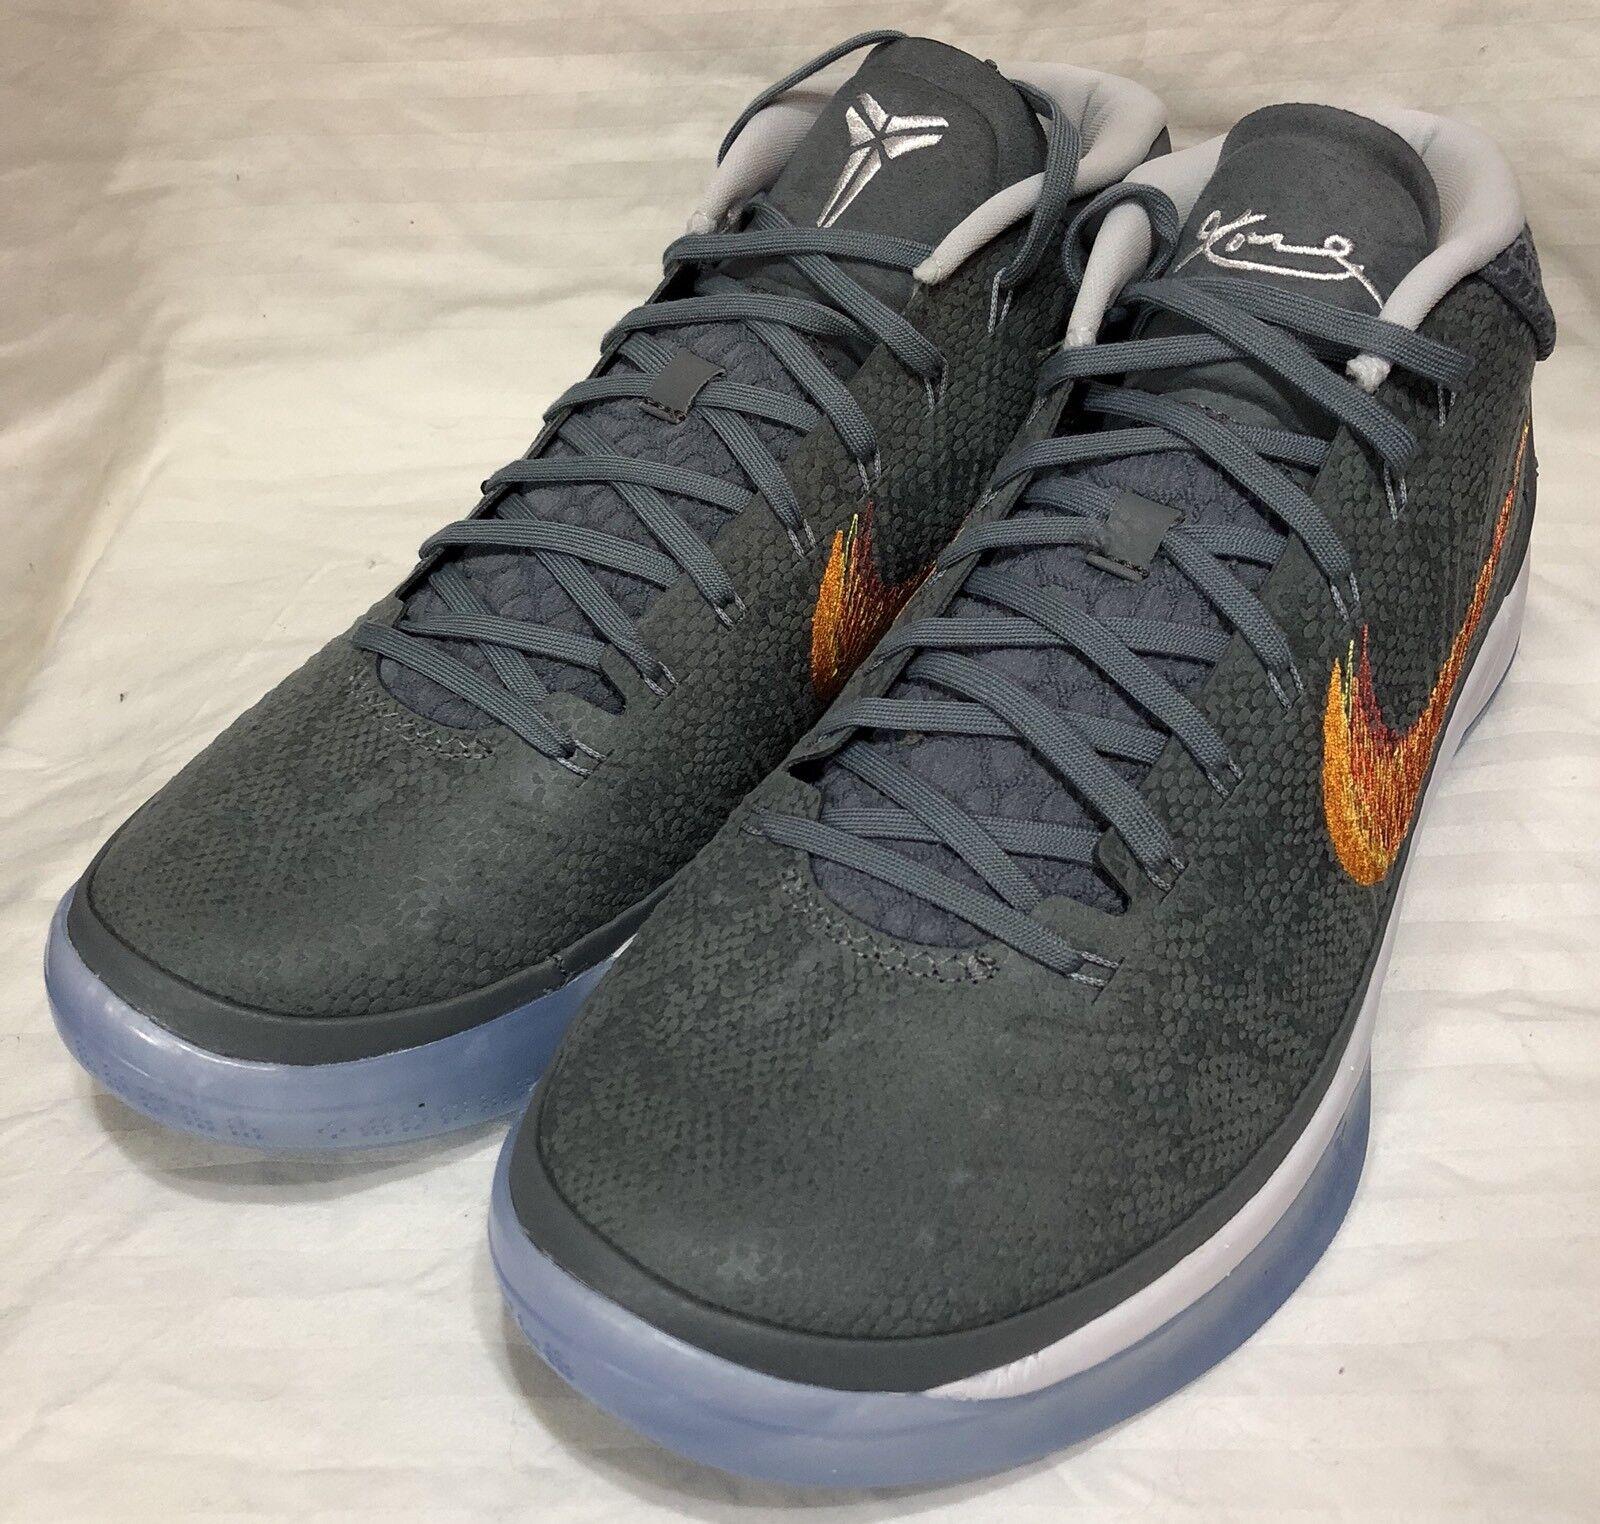 Nike Kobe AD Chrome/Habanero Red 922482-005 Basketball Shoes Size 10 922482-005 Red bbe052